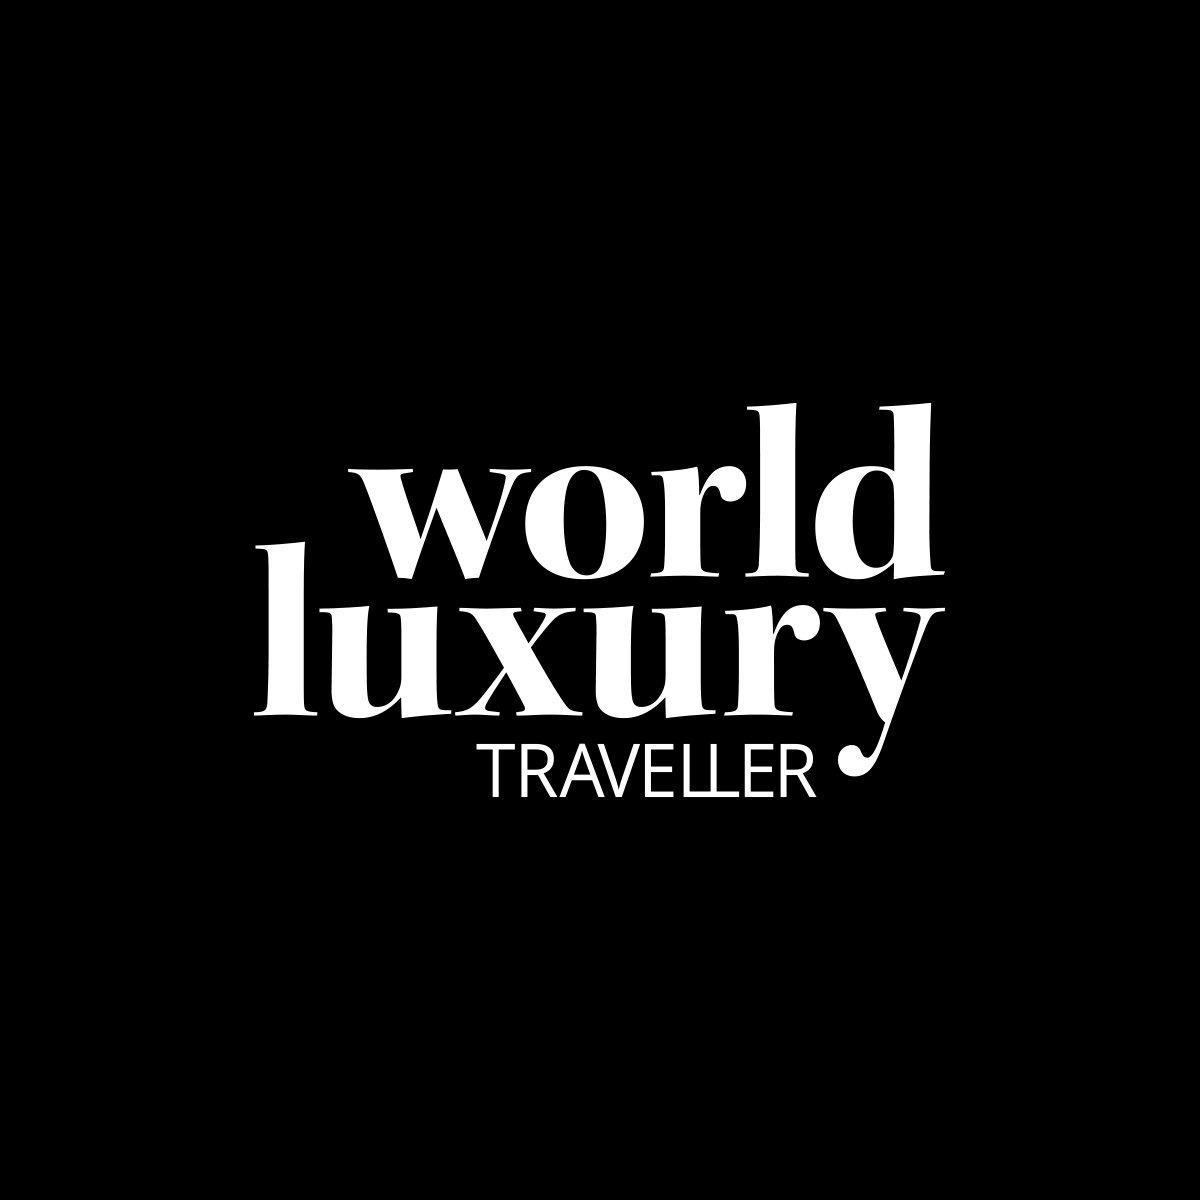 World Luxury Traveller Logo